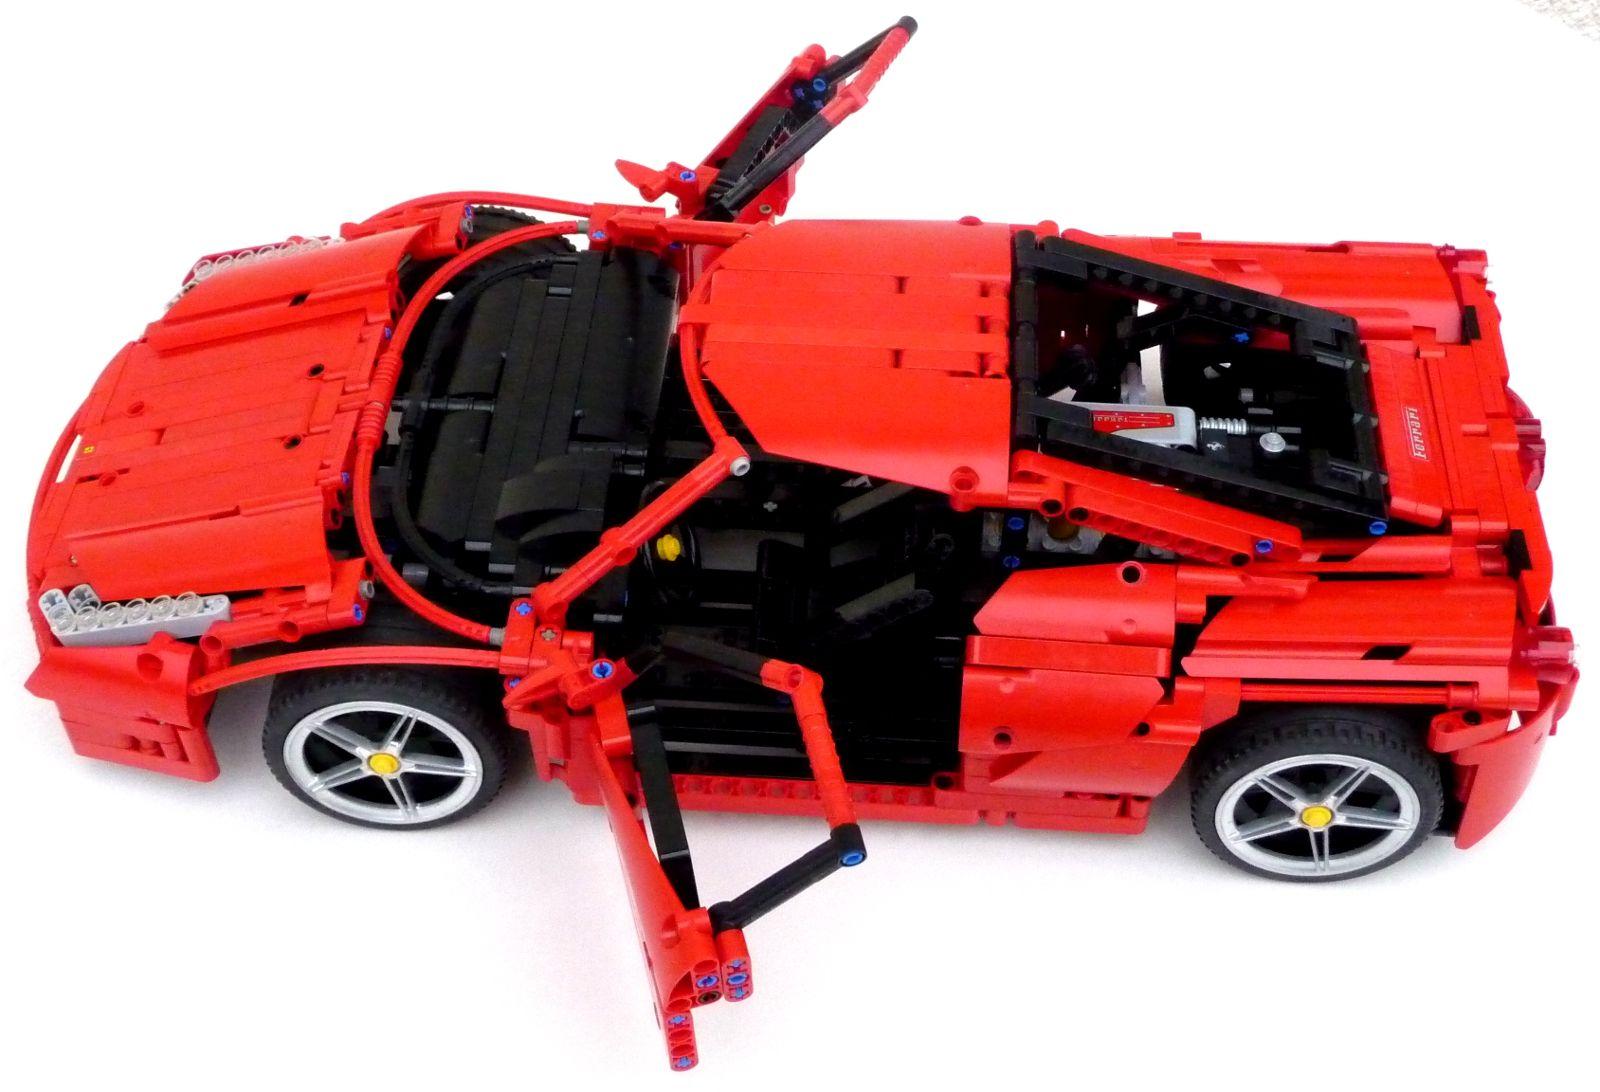 ferrari 458 italia hobby lego lego lego technic. Black Bedroom Furniture Sets. Home Design Ideas